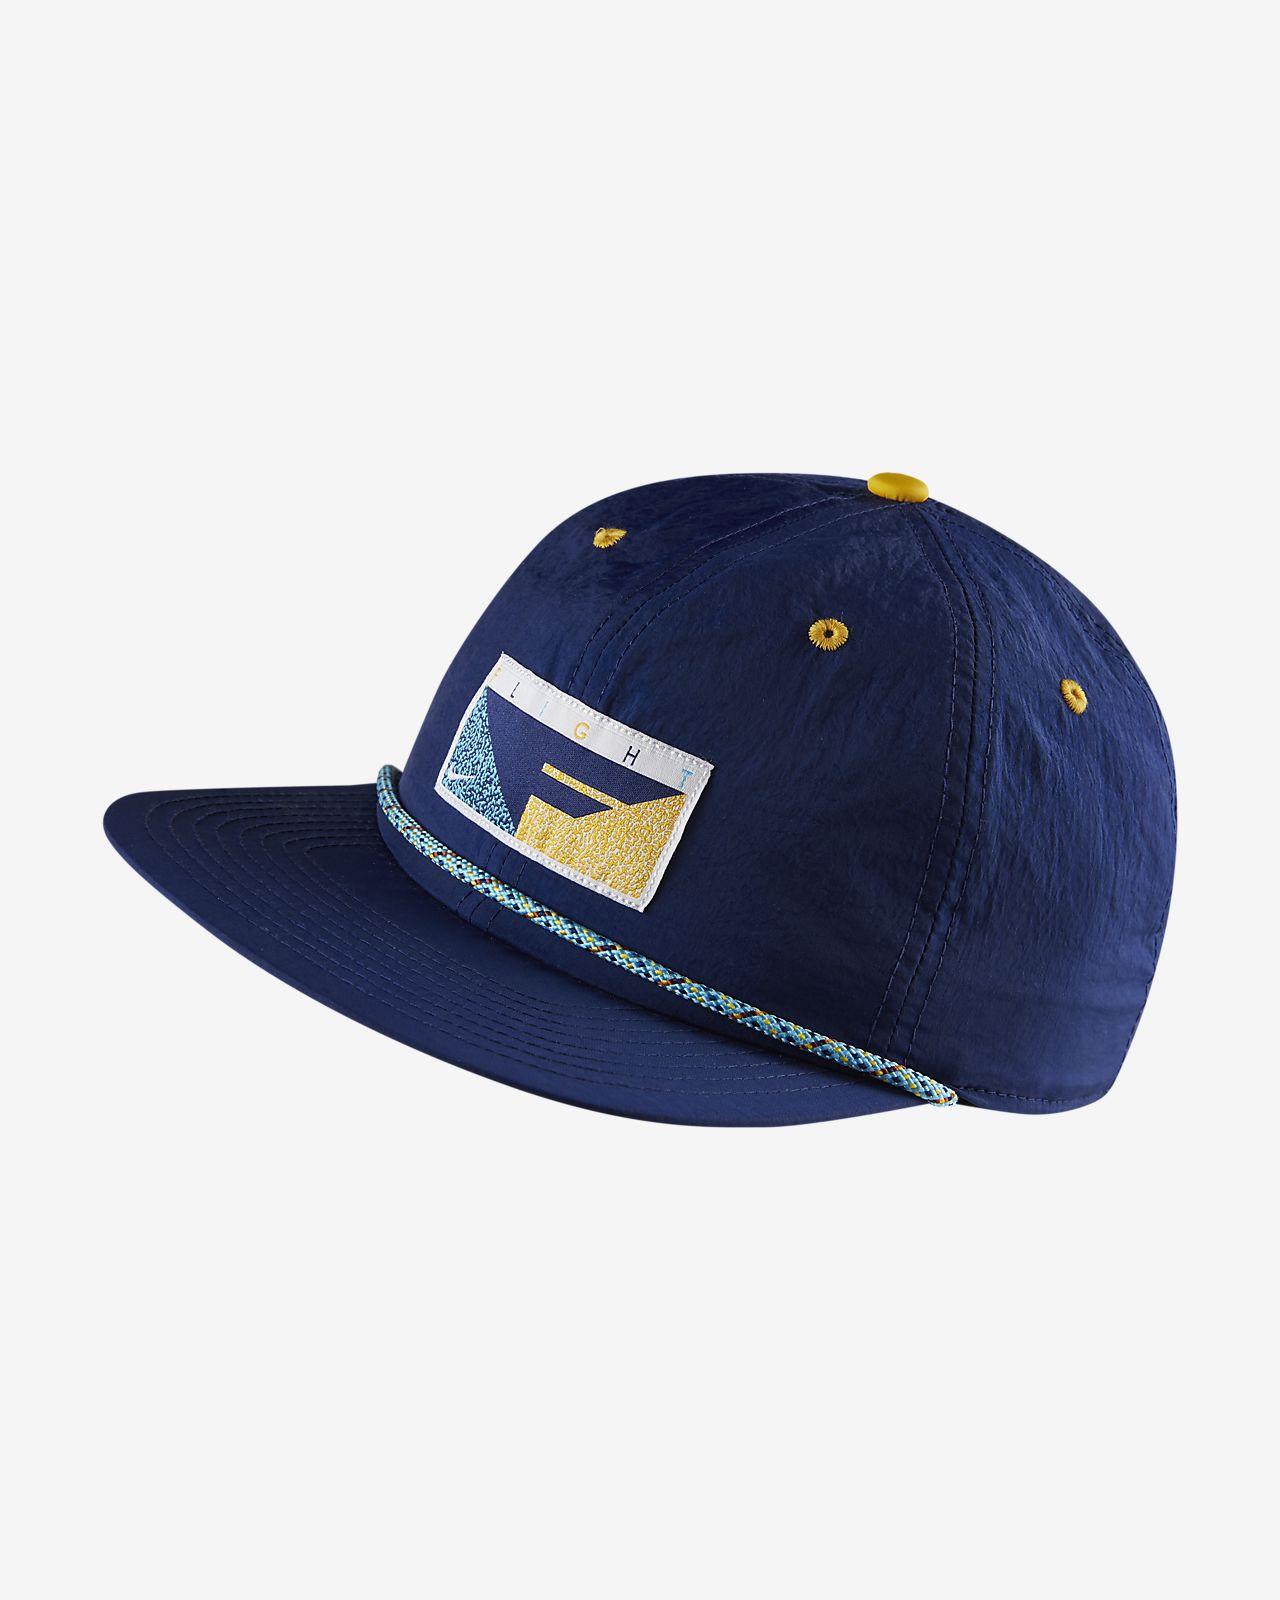 Nike Flight 籃球帽款